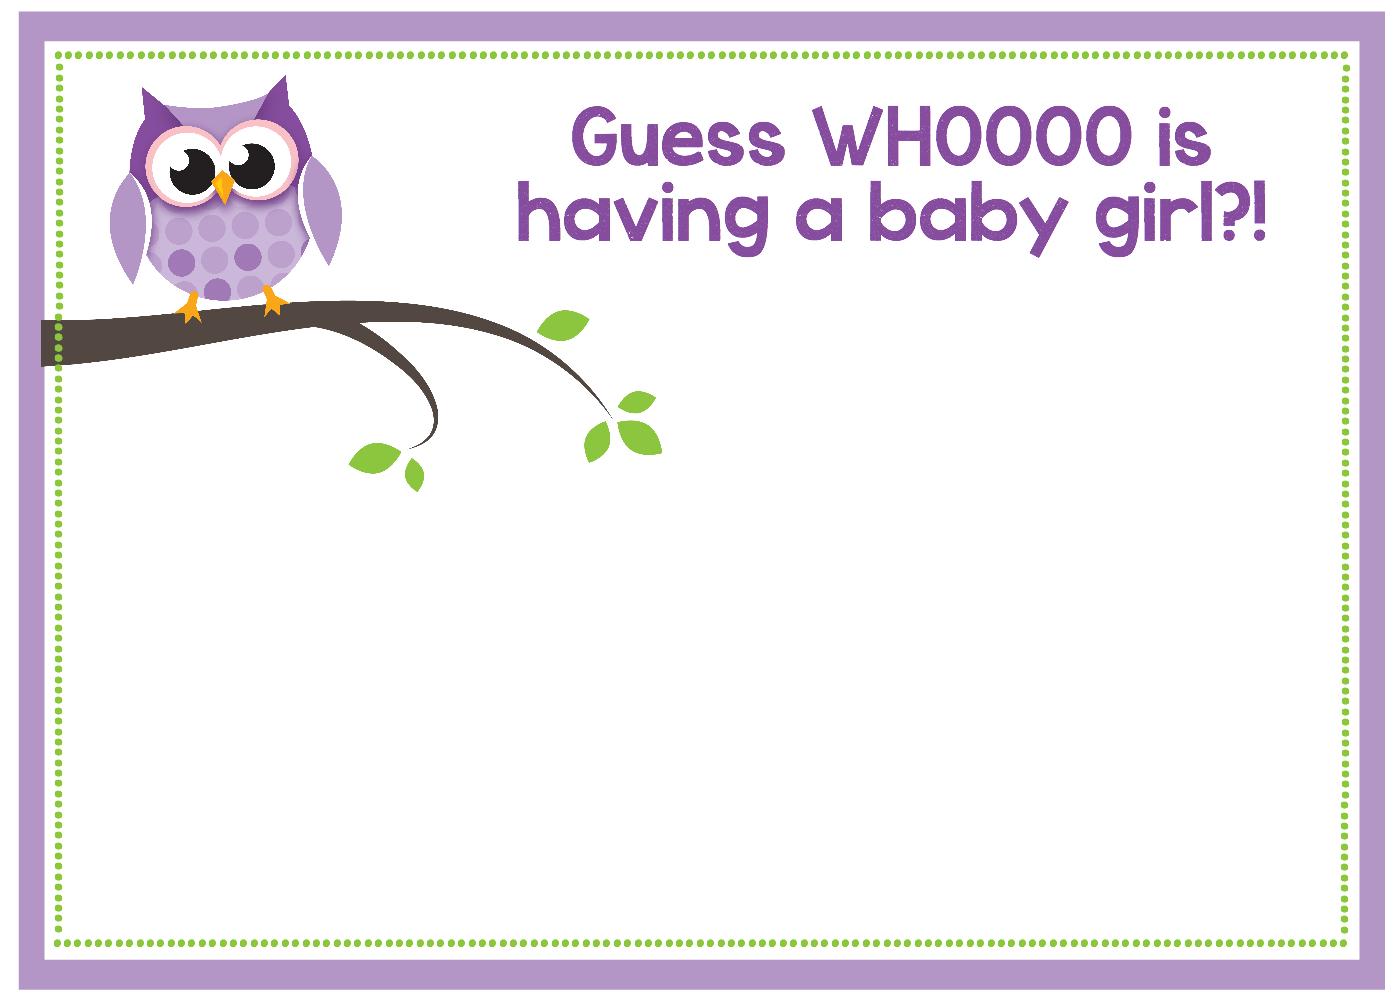 Free Printable Owl Baby Shower Invitations {& Other Printables} - Create Your Own Baby Shower Invitations Free Printable